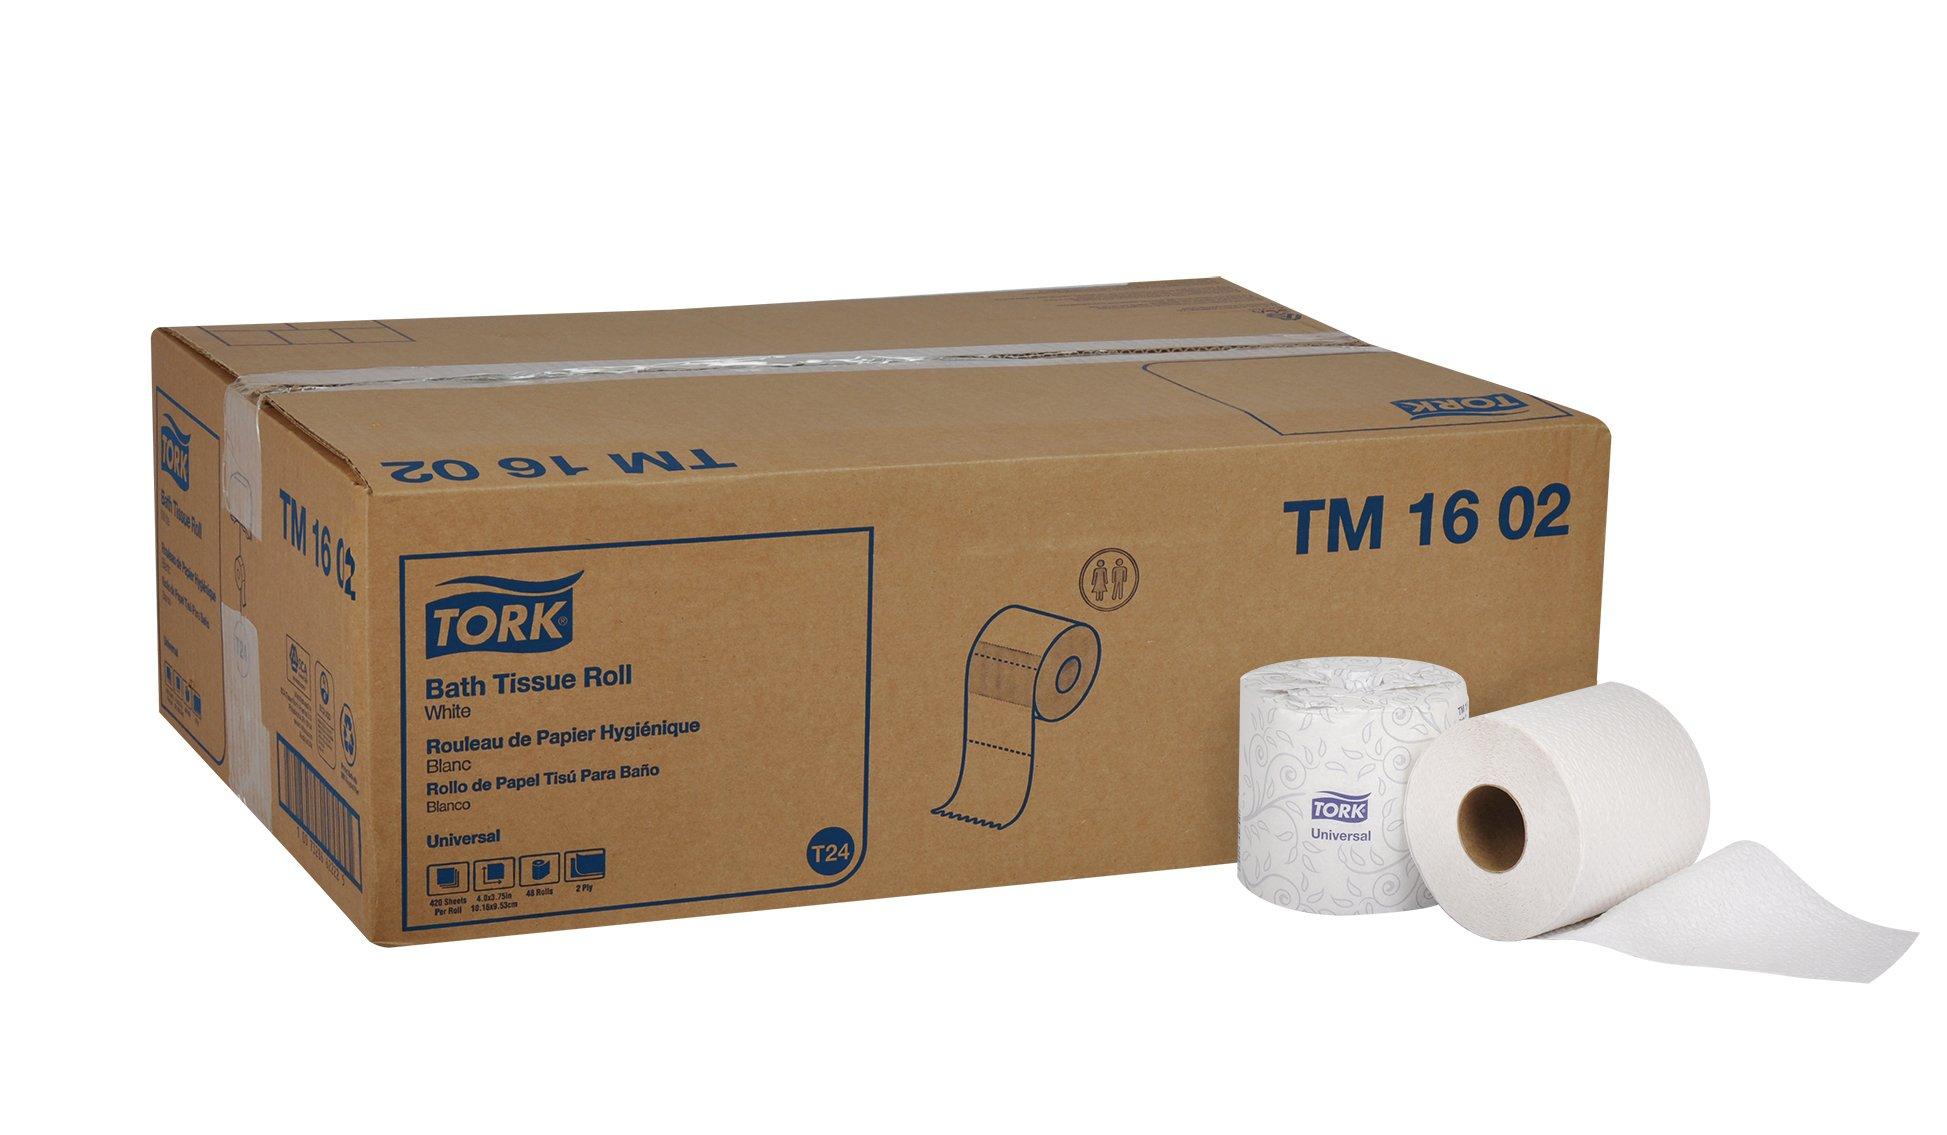 Tork Universal TM1602 Bath Tissue Roll, 2-Ply, 4'' Width x 3.75'' Length, White (Case of 48 Rolls, 420 per roll, 20,160 Sheets)